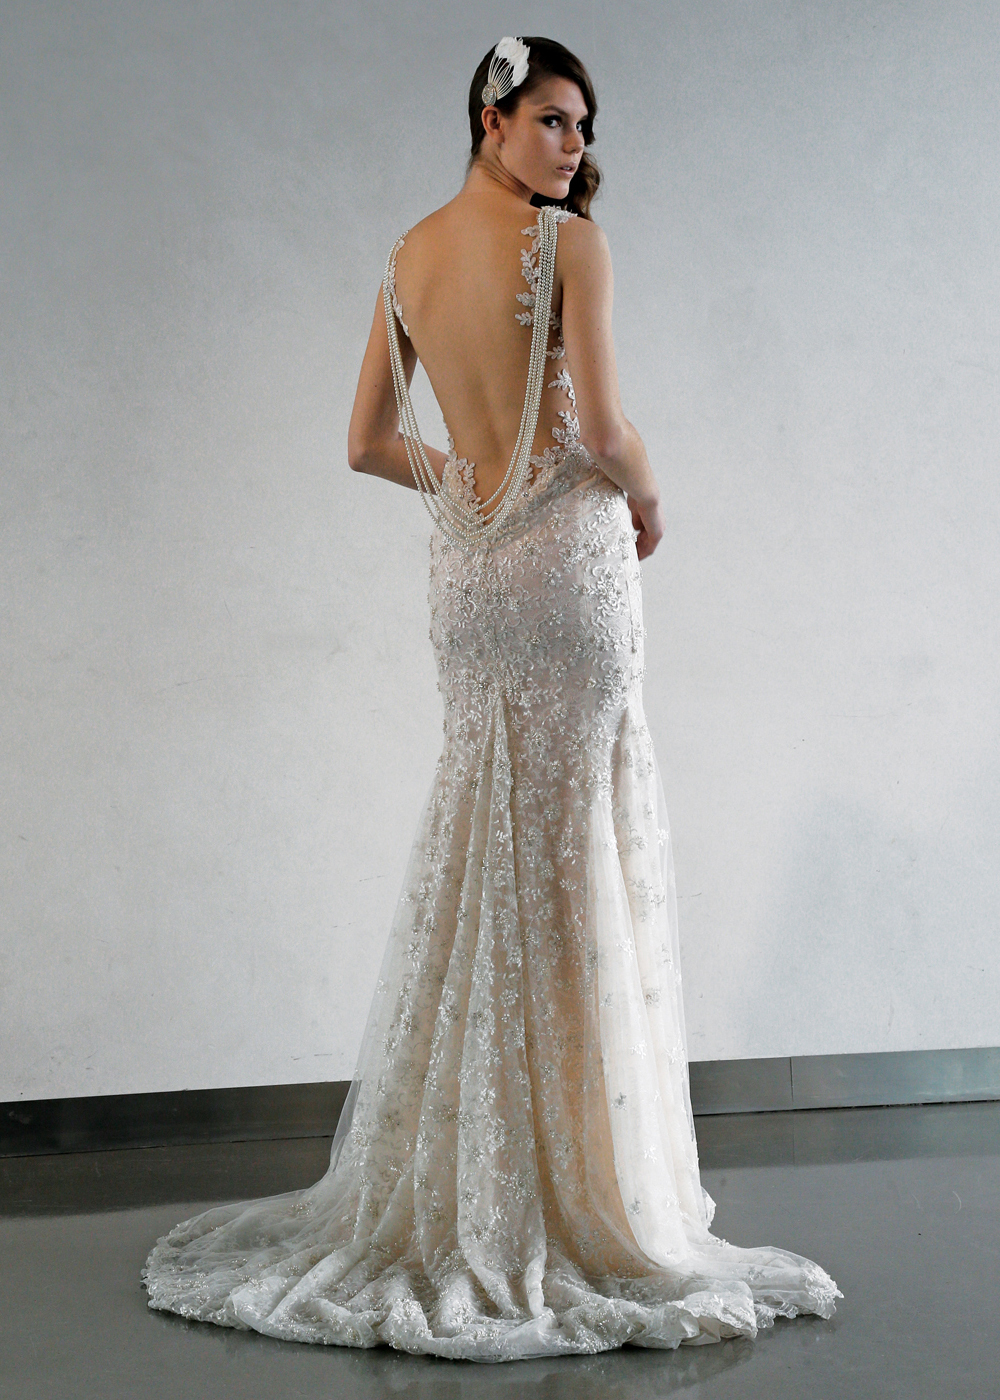 Galia Lahav Glamorous Backless Fit To Flare Wedding Gown